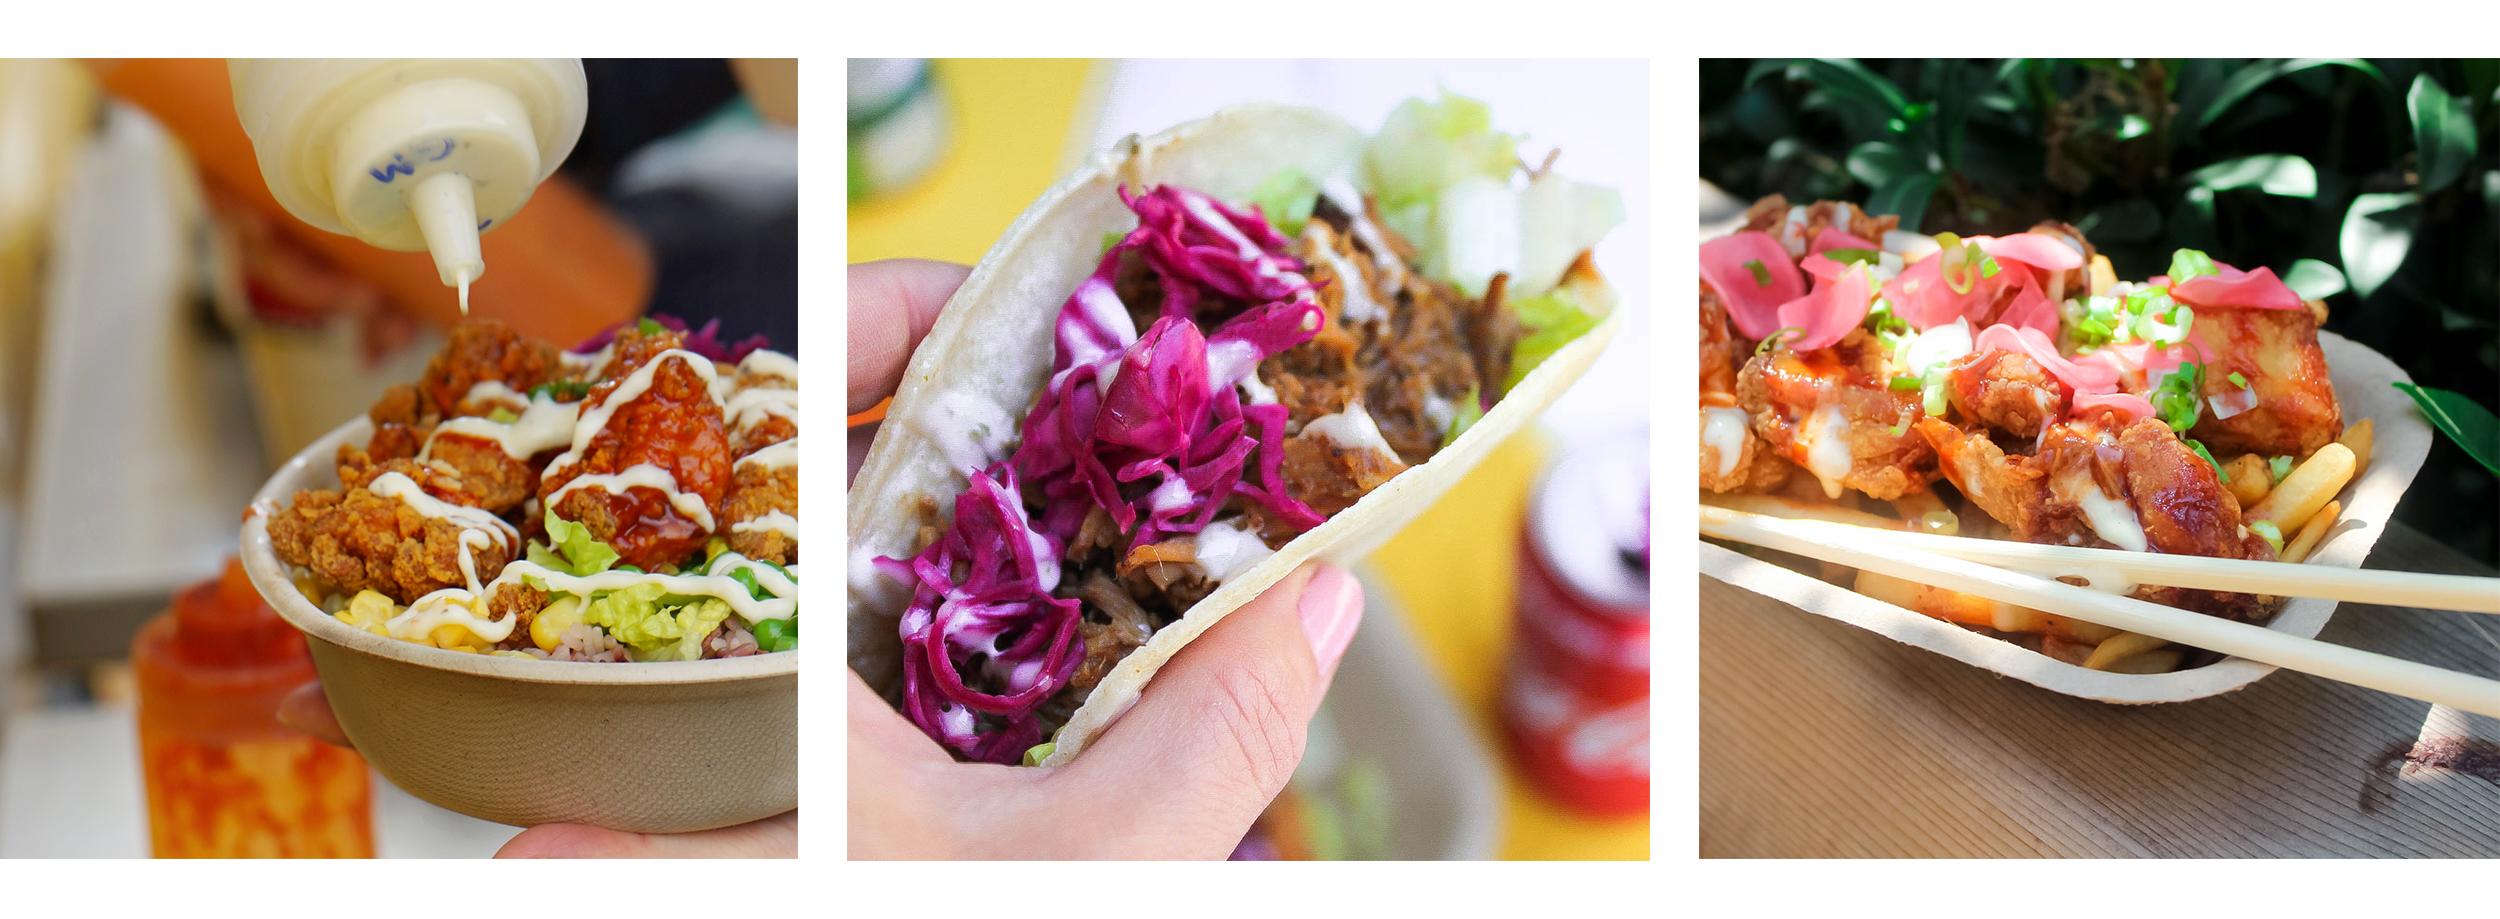 discocheetah-foodpics.jpg